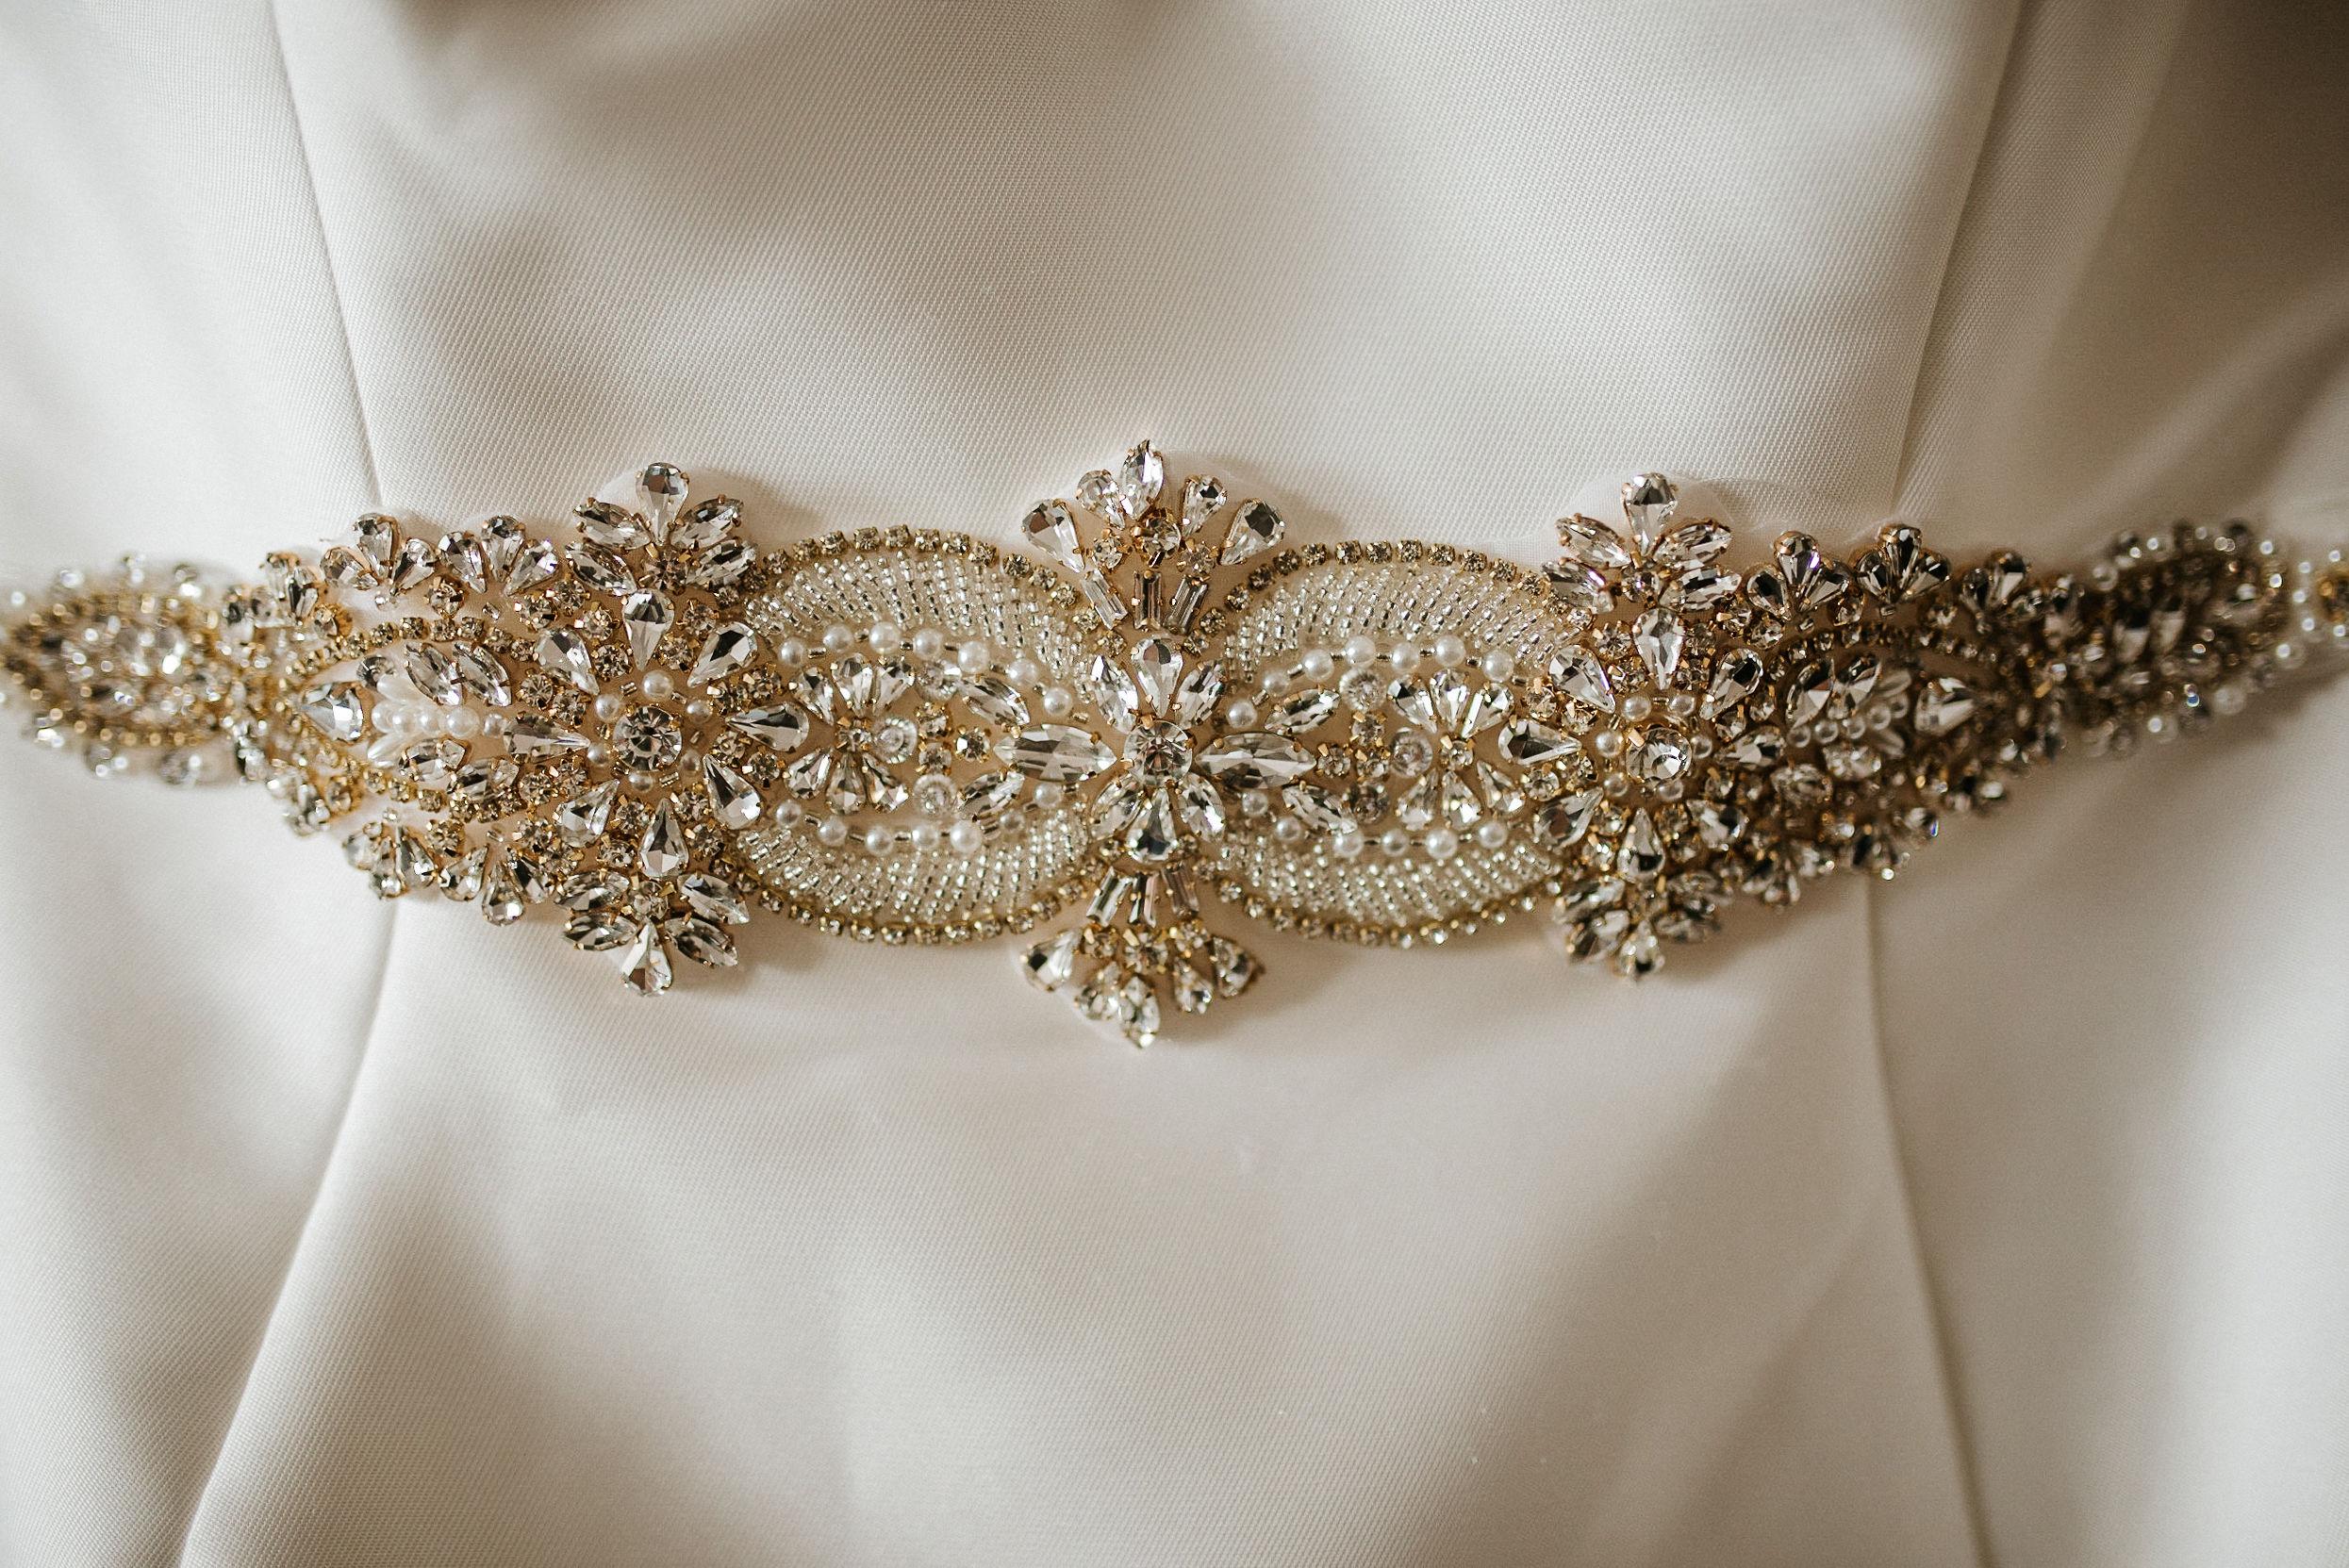 detail shot of wedding dress at the kimpton carlyle hotel